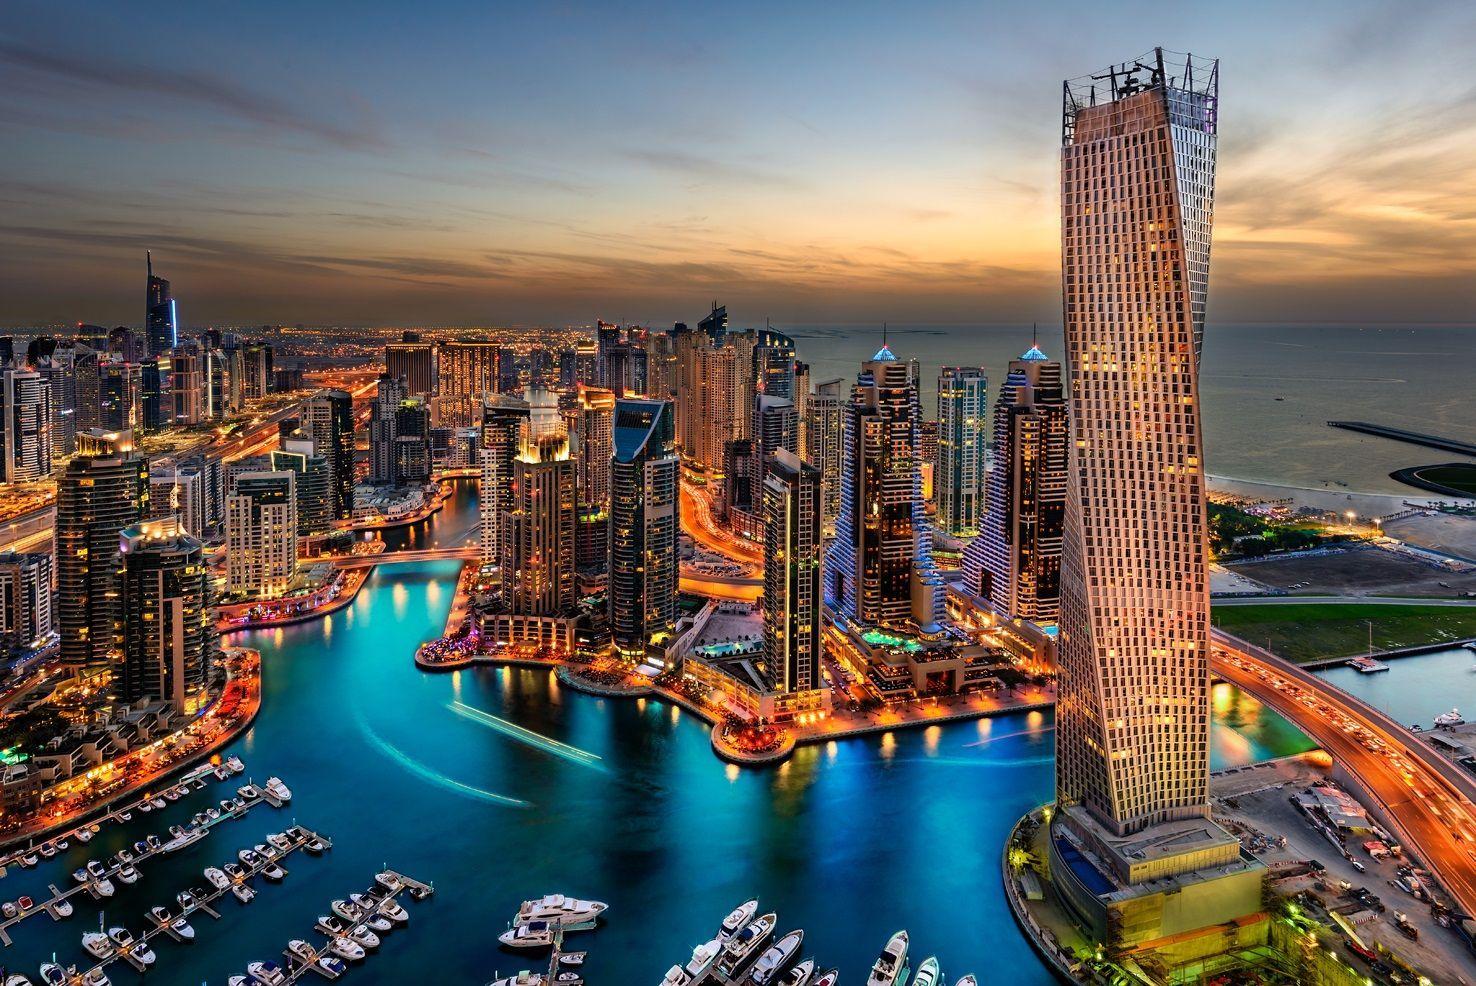 ¿A qué país pertenece Dubái?